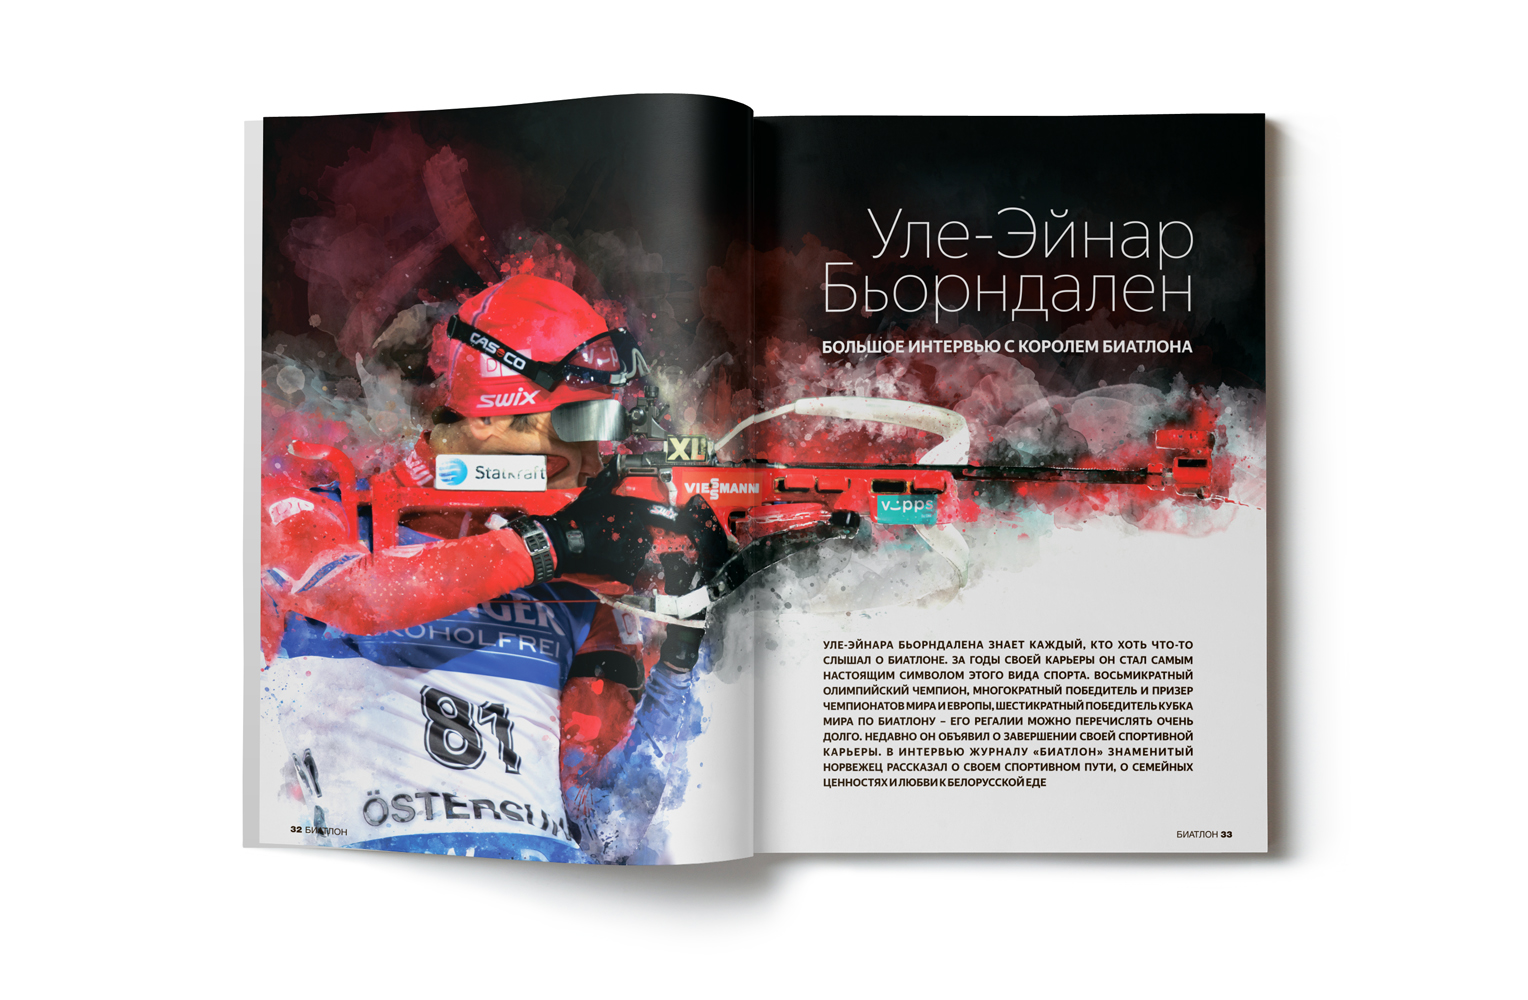 biathlon-magazine-pages-2